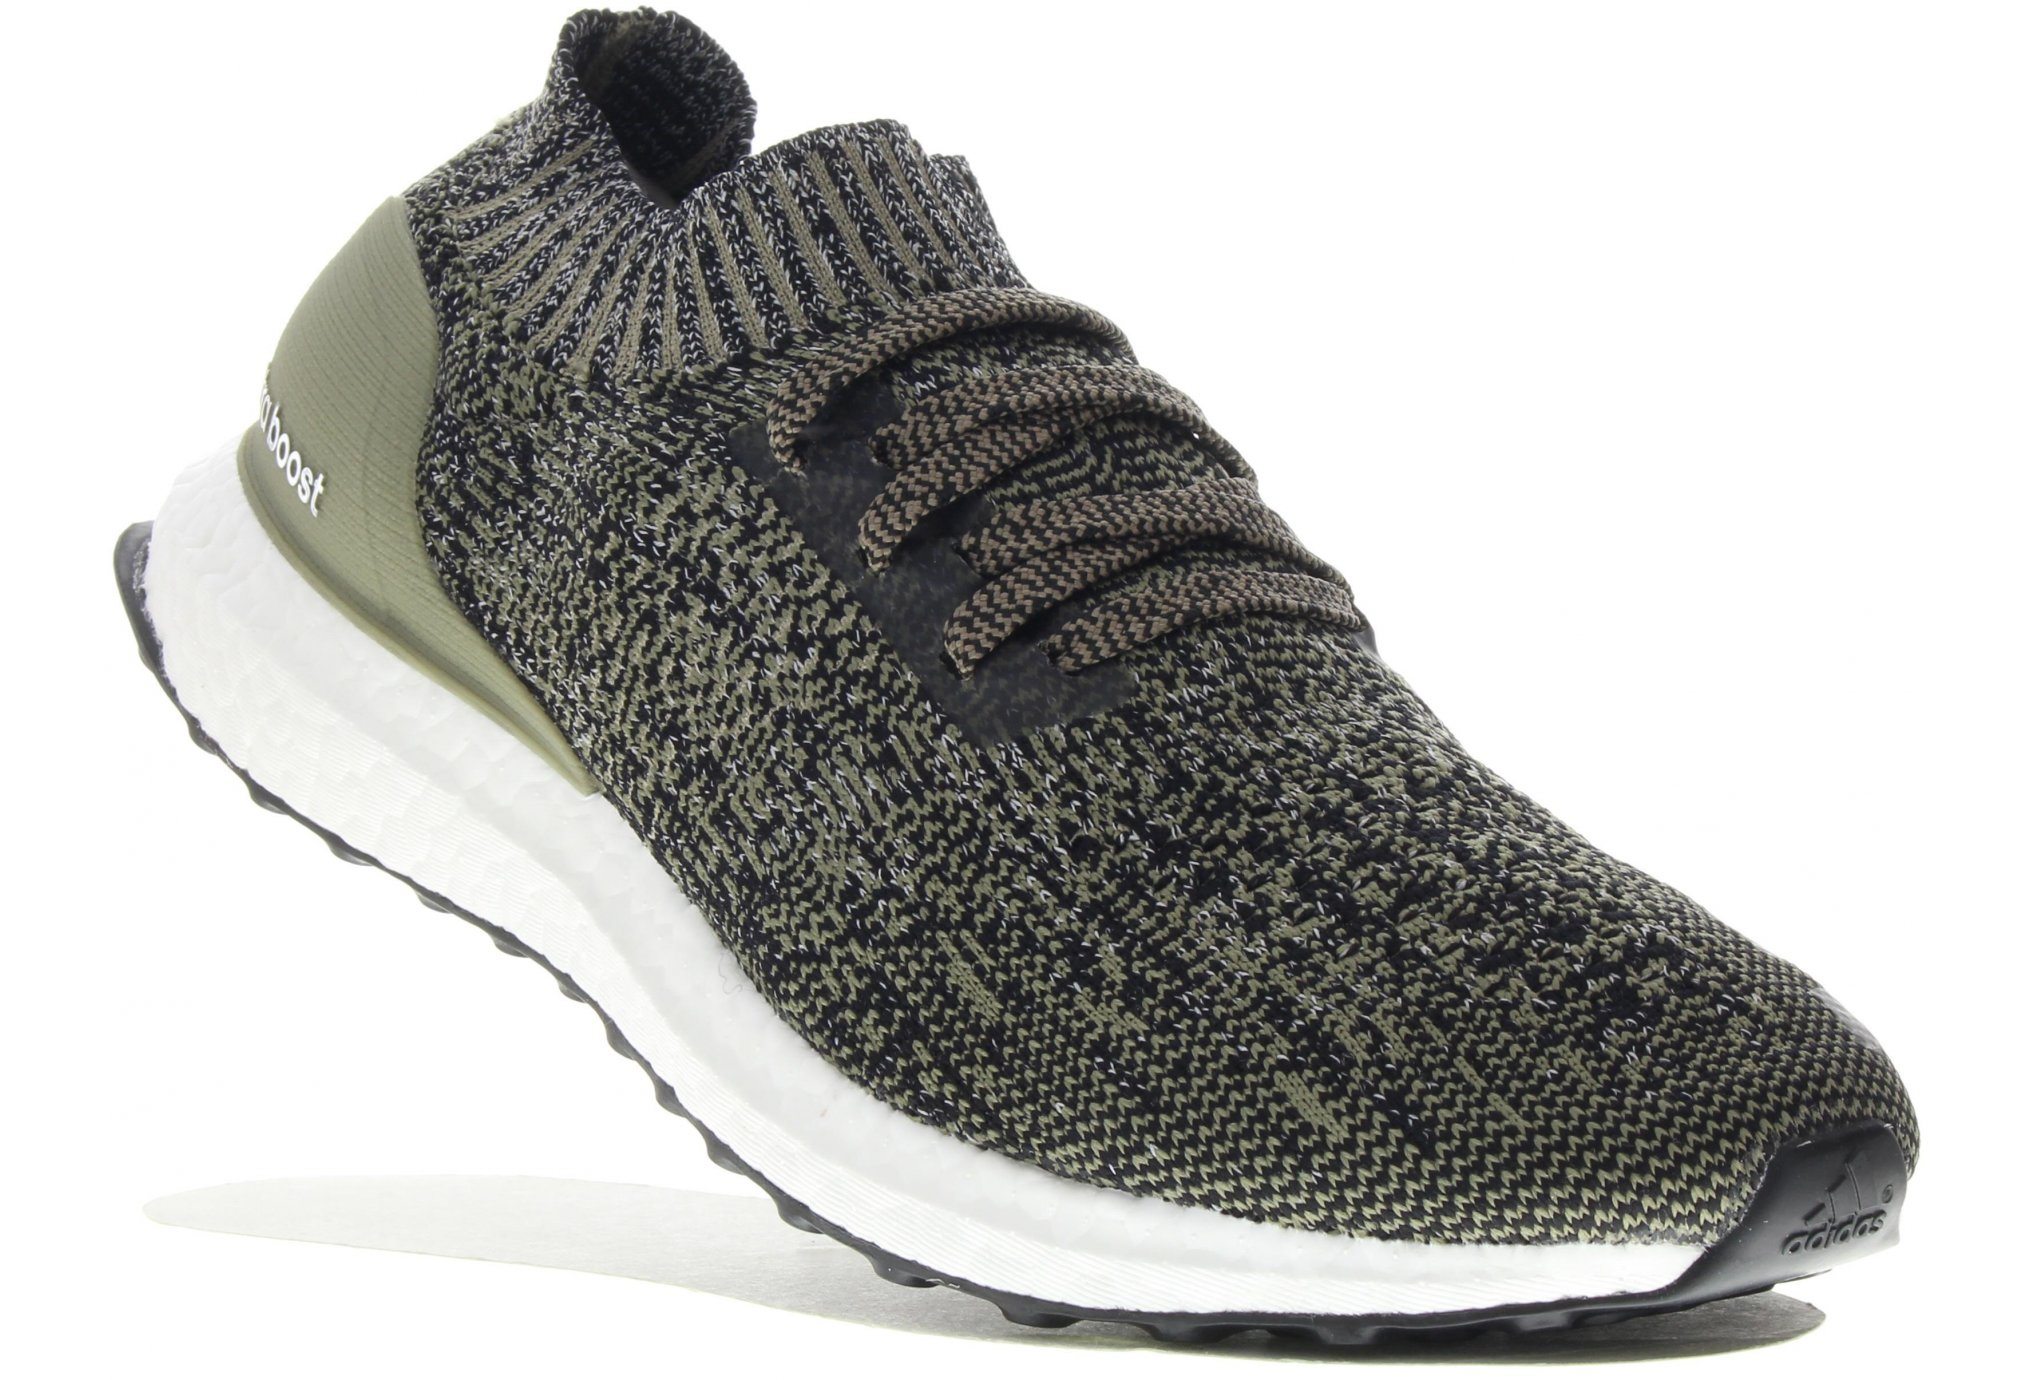 Adidas Homme M Uncaged Ultraboost Chaussures La Fortifiée yfY7b6g